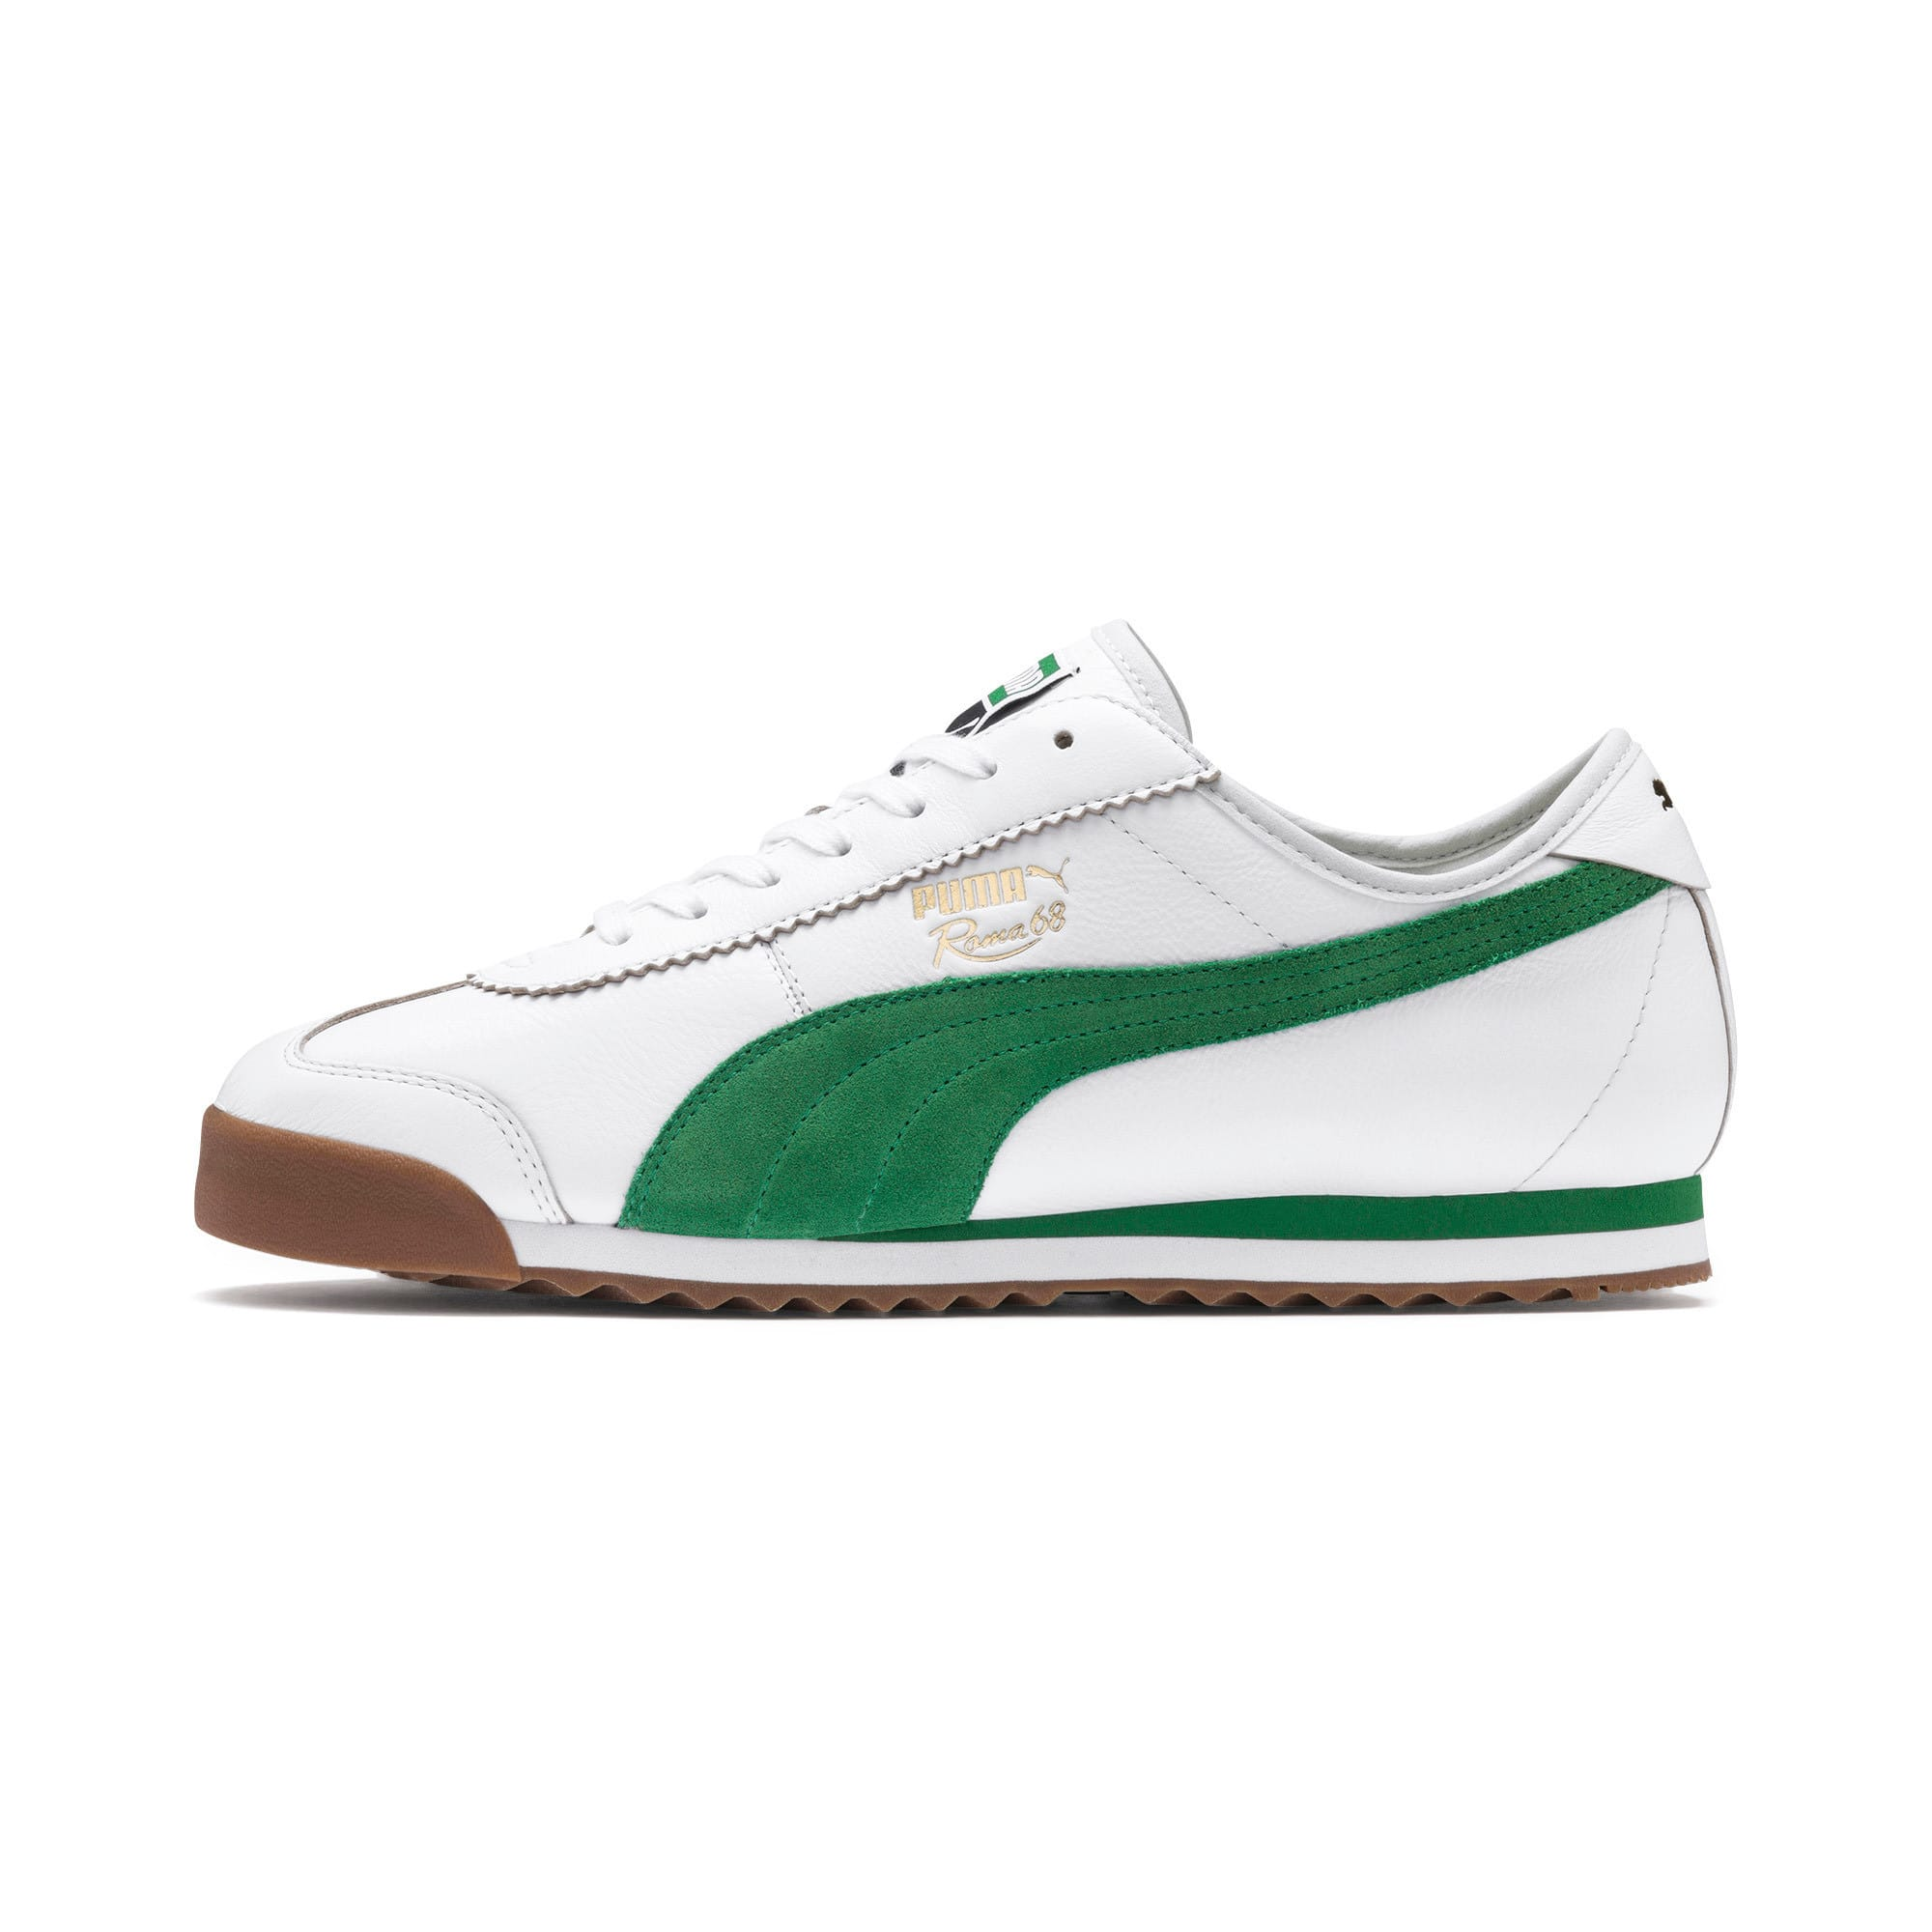 Thumbnail 1 of ローマ '68 OG スニーカー, Puma White-Amazon Green, medium-JPN